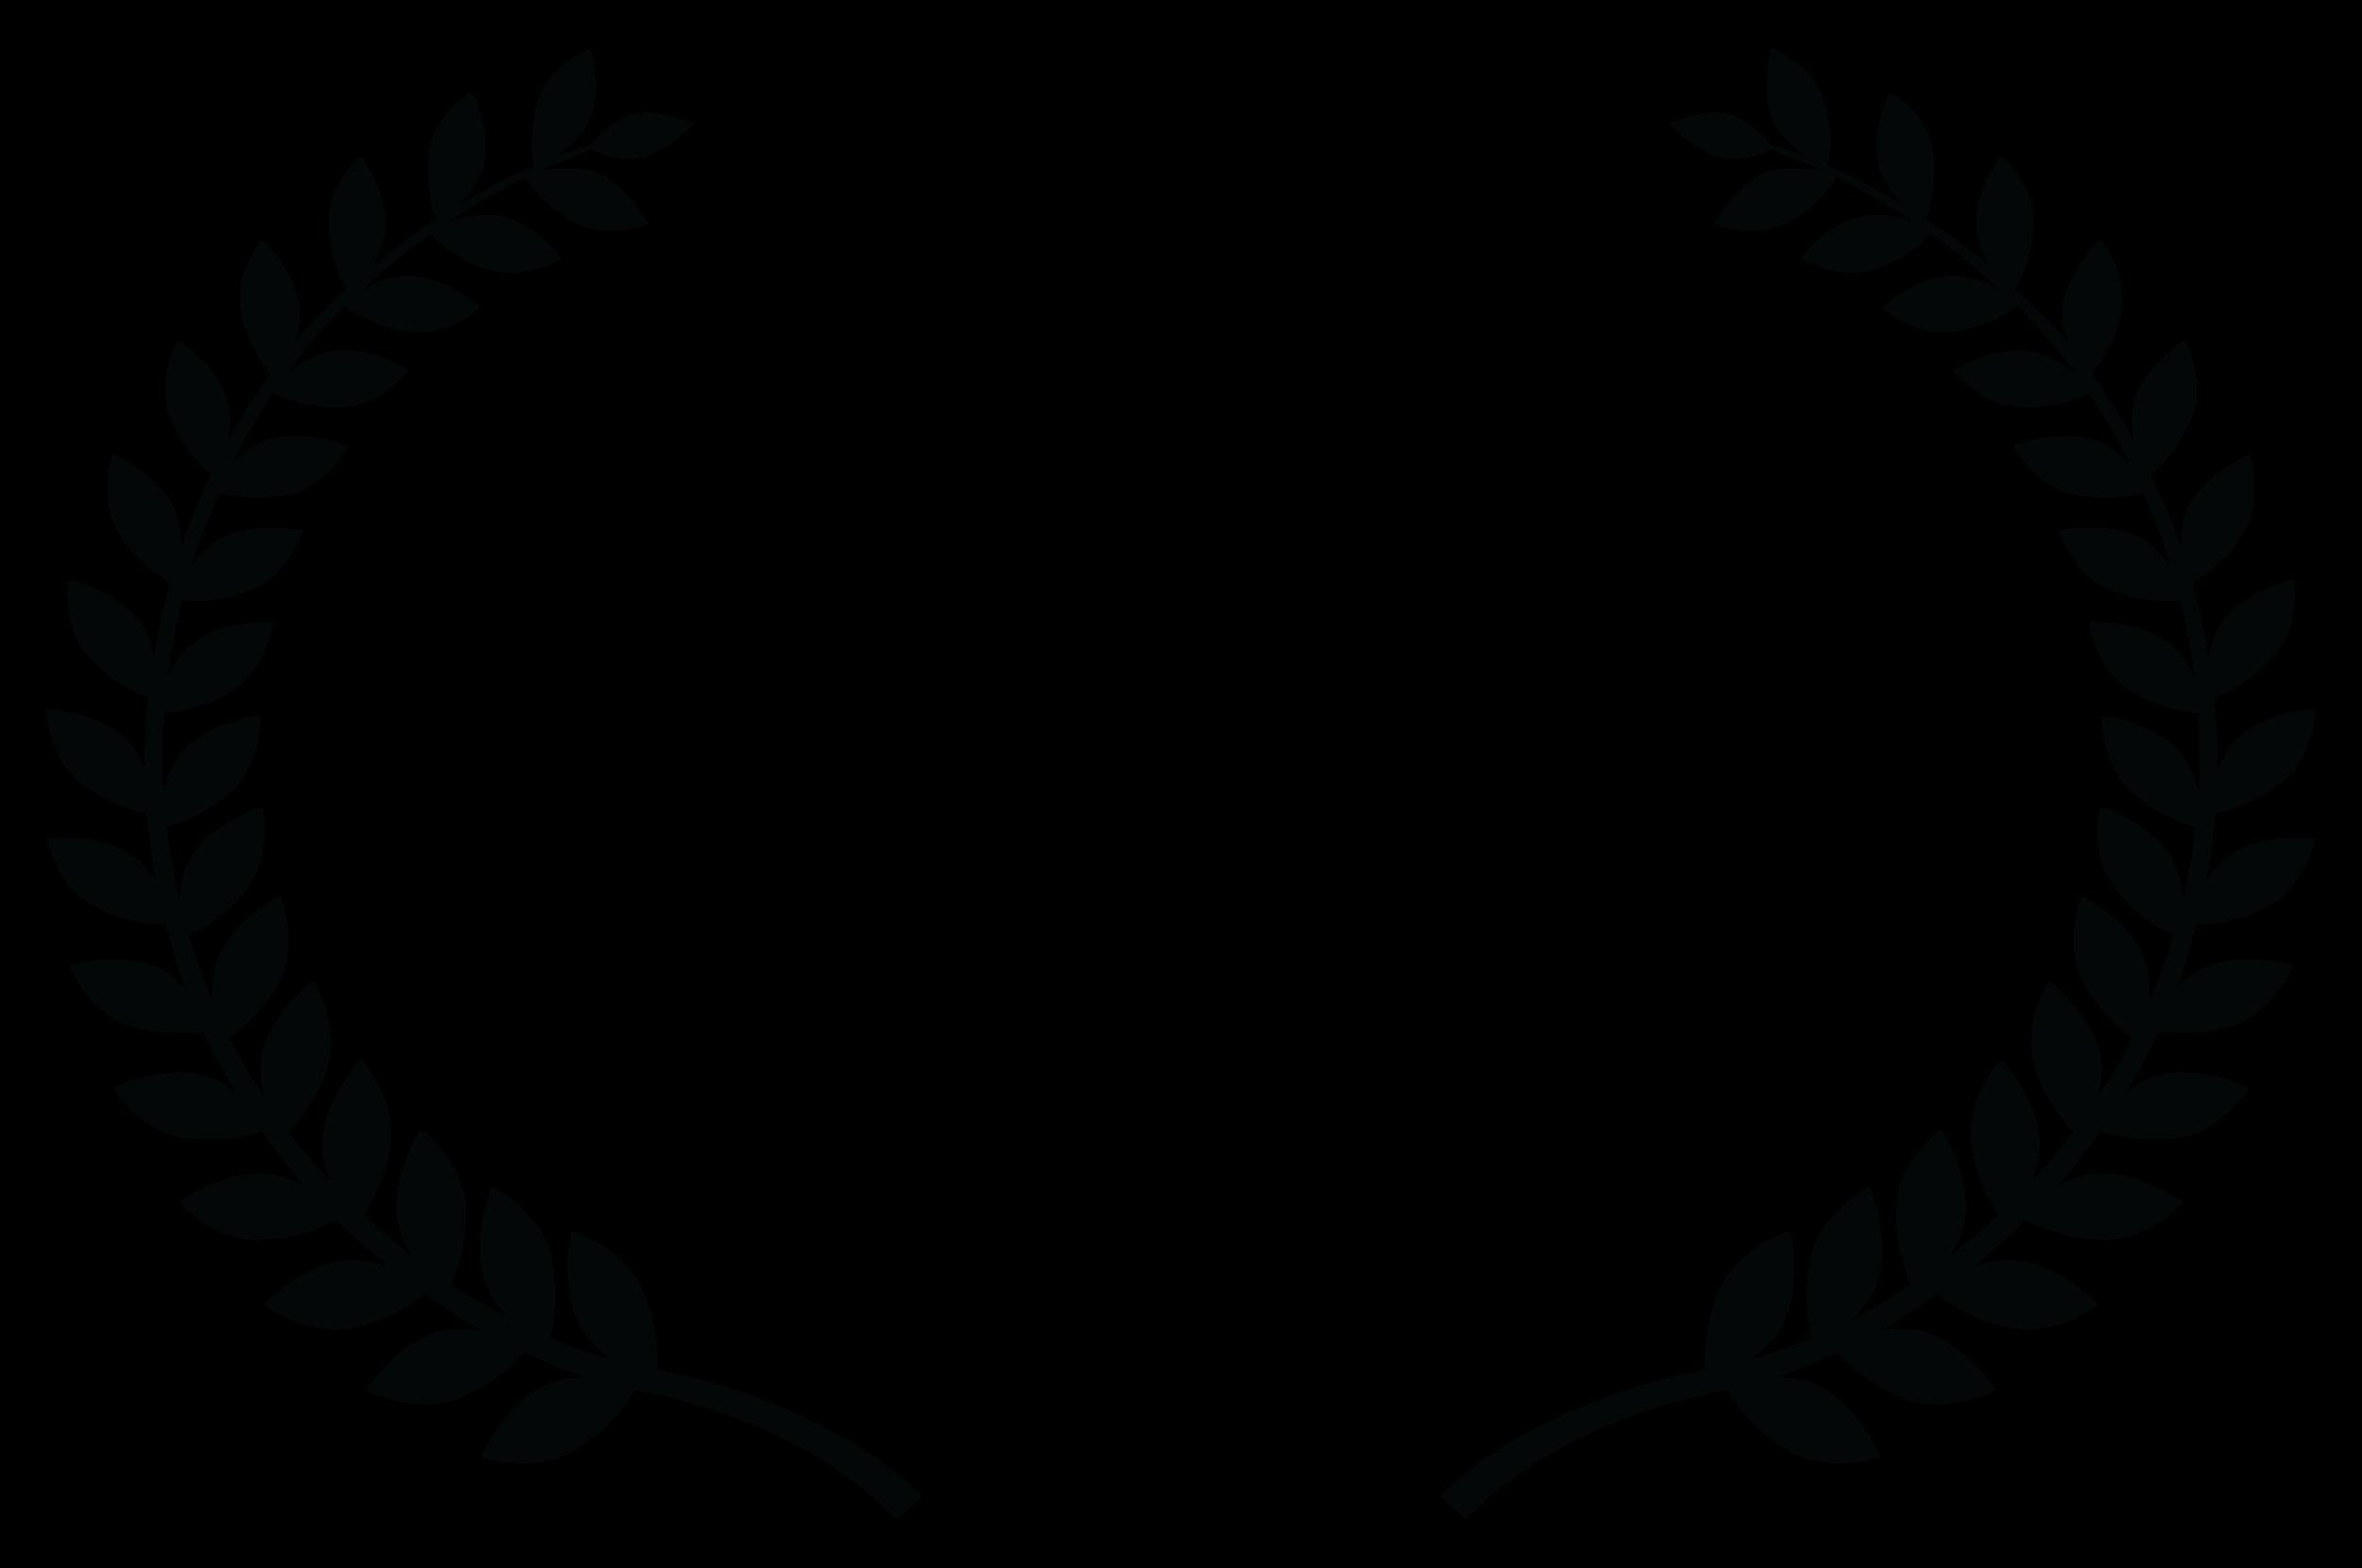 OFFICIALSELECTION-SanJoseInternationalShortFilmFestival-2017.png